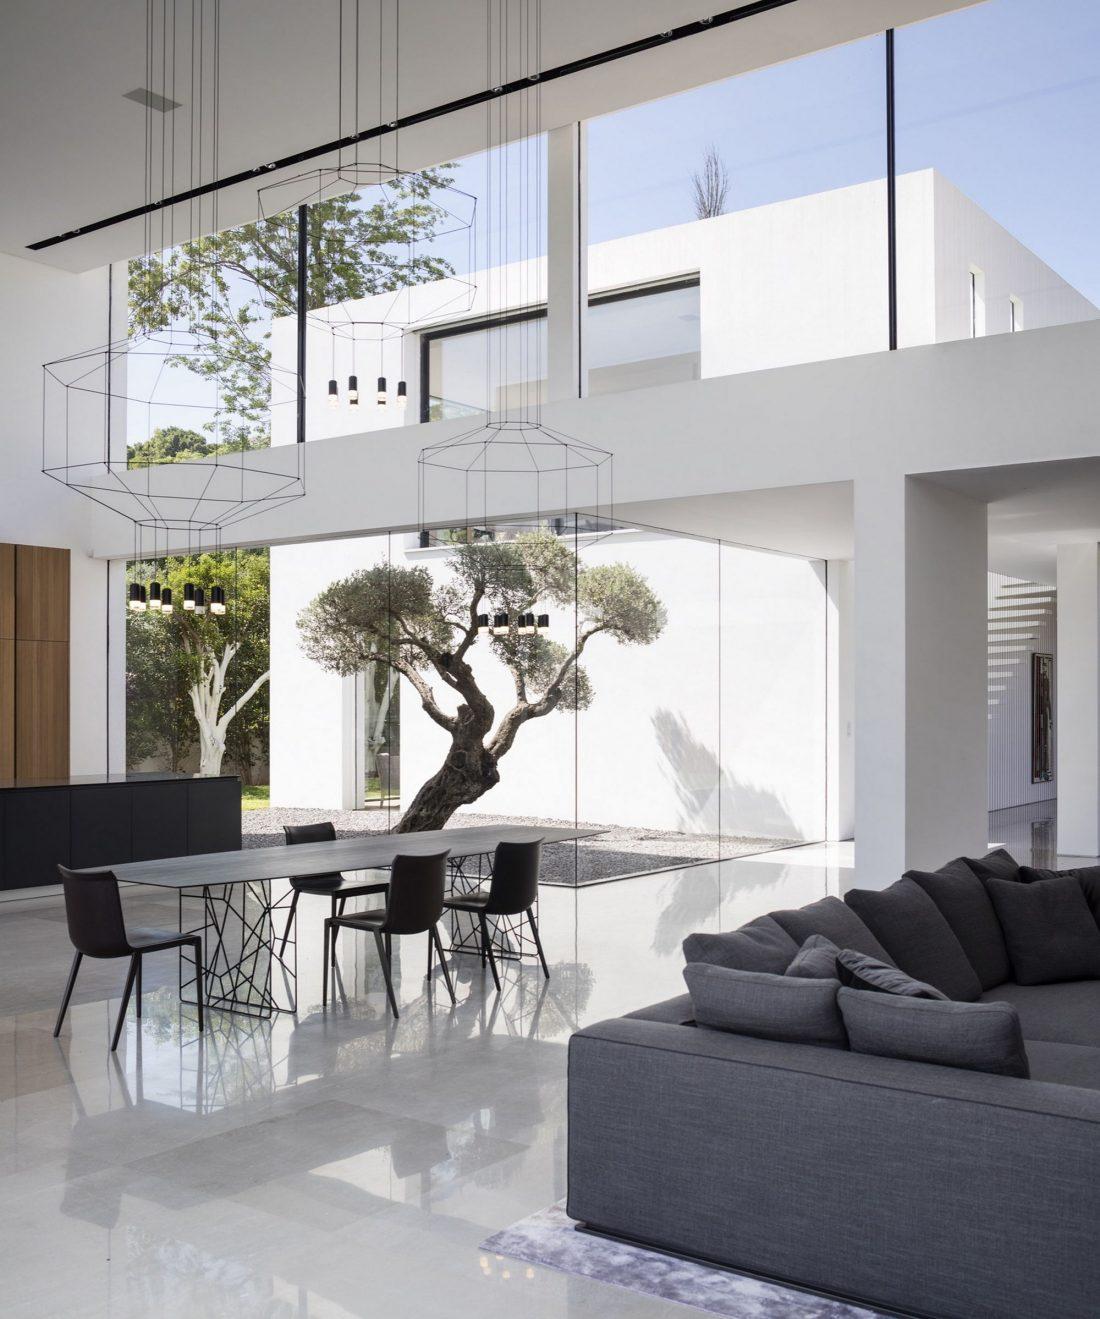 700-kvadratnyh-metrov-sveta-f-house-po-proektu-studii-pitsou-kedem-30